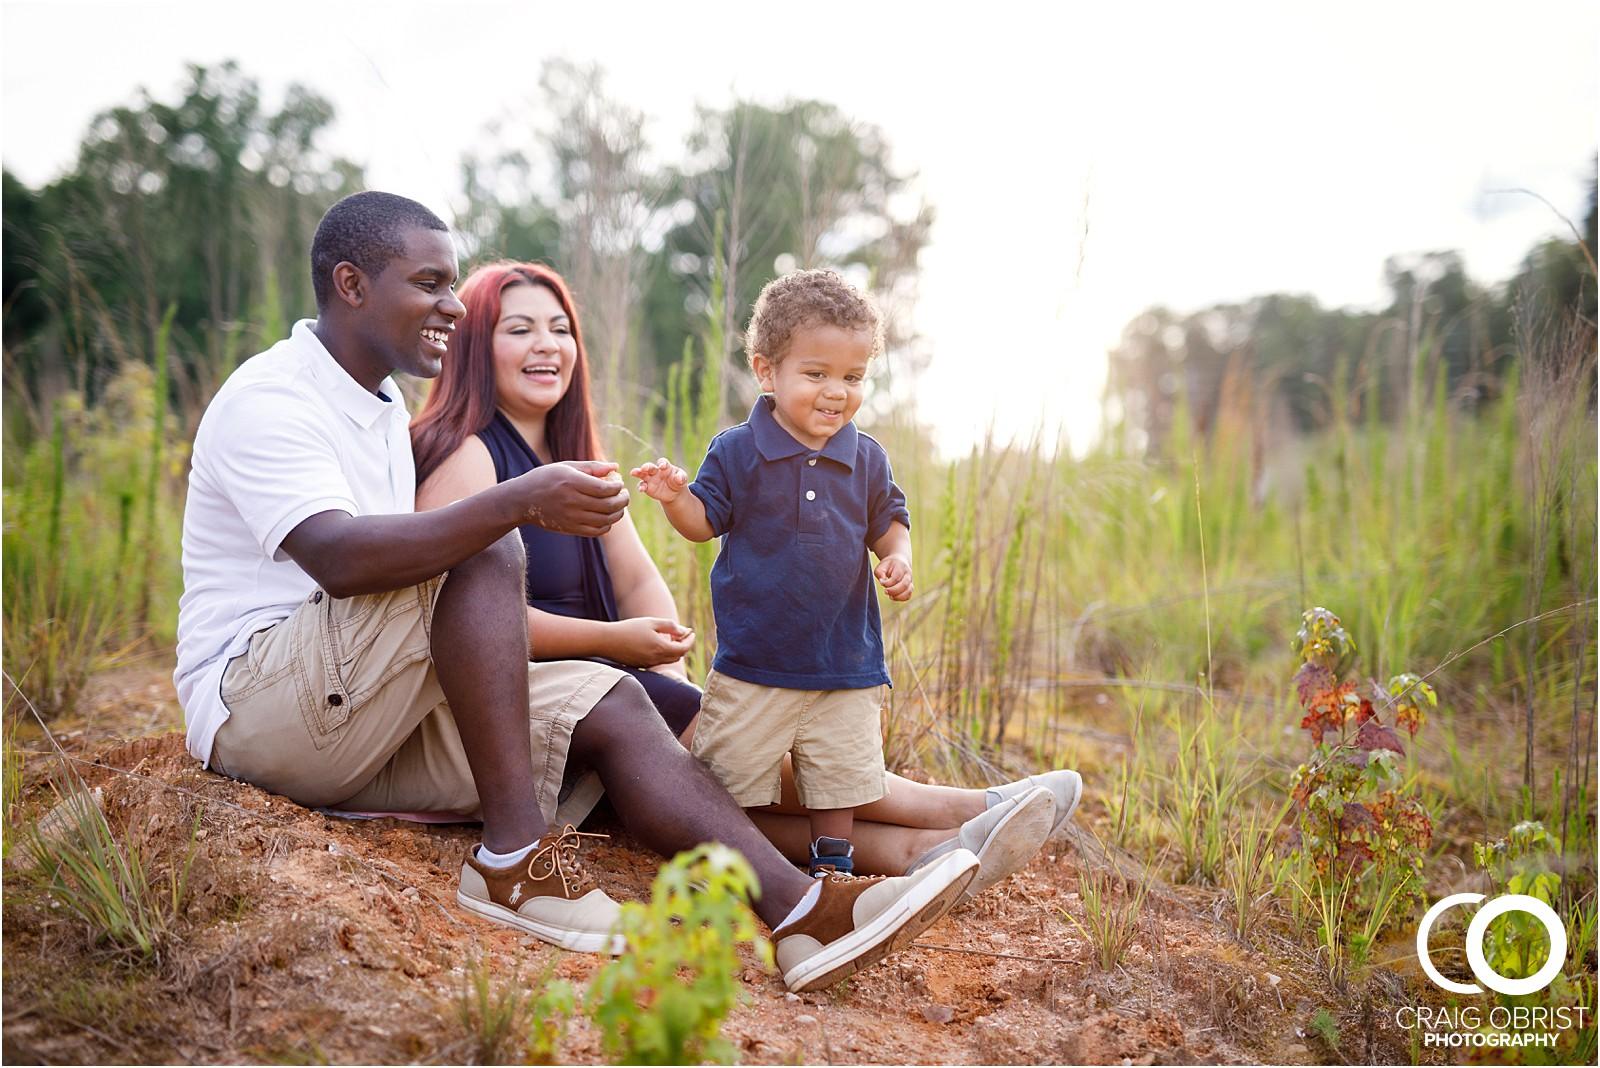 Grass Field Family Portratis Sunset Atlanta_0024.jpg